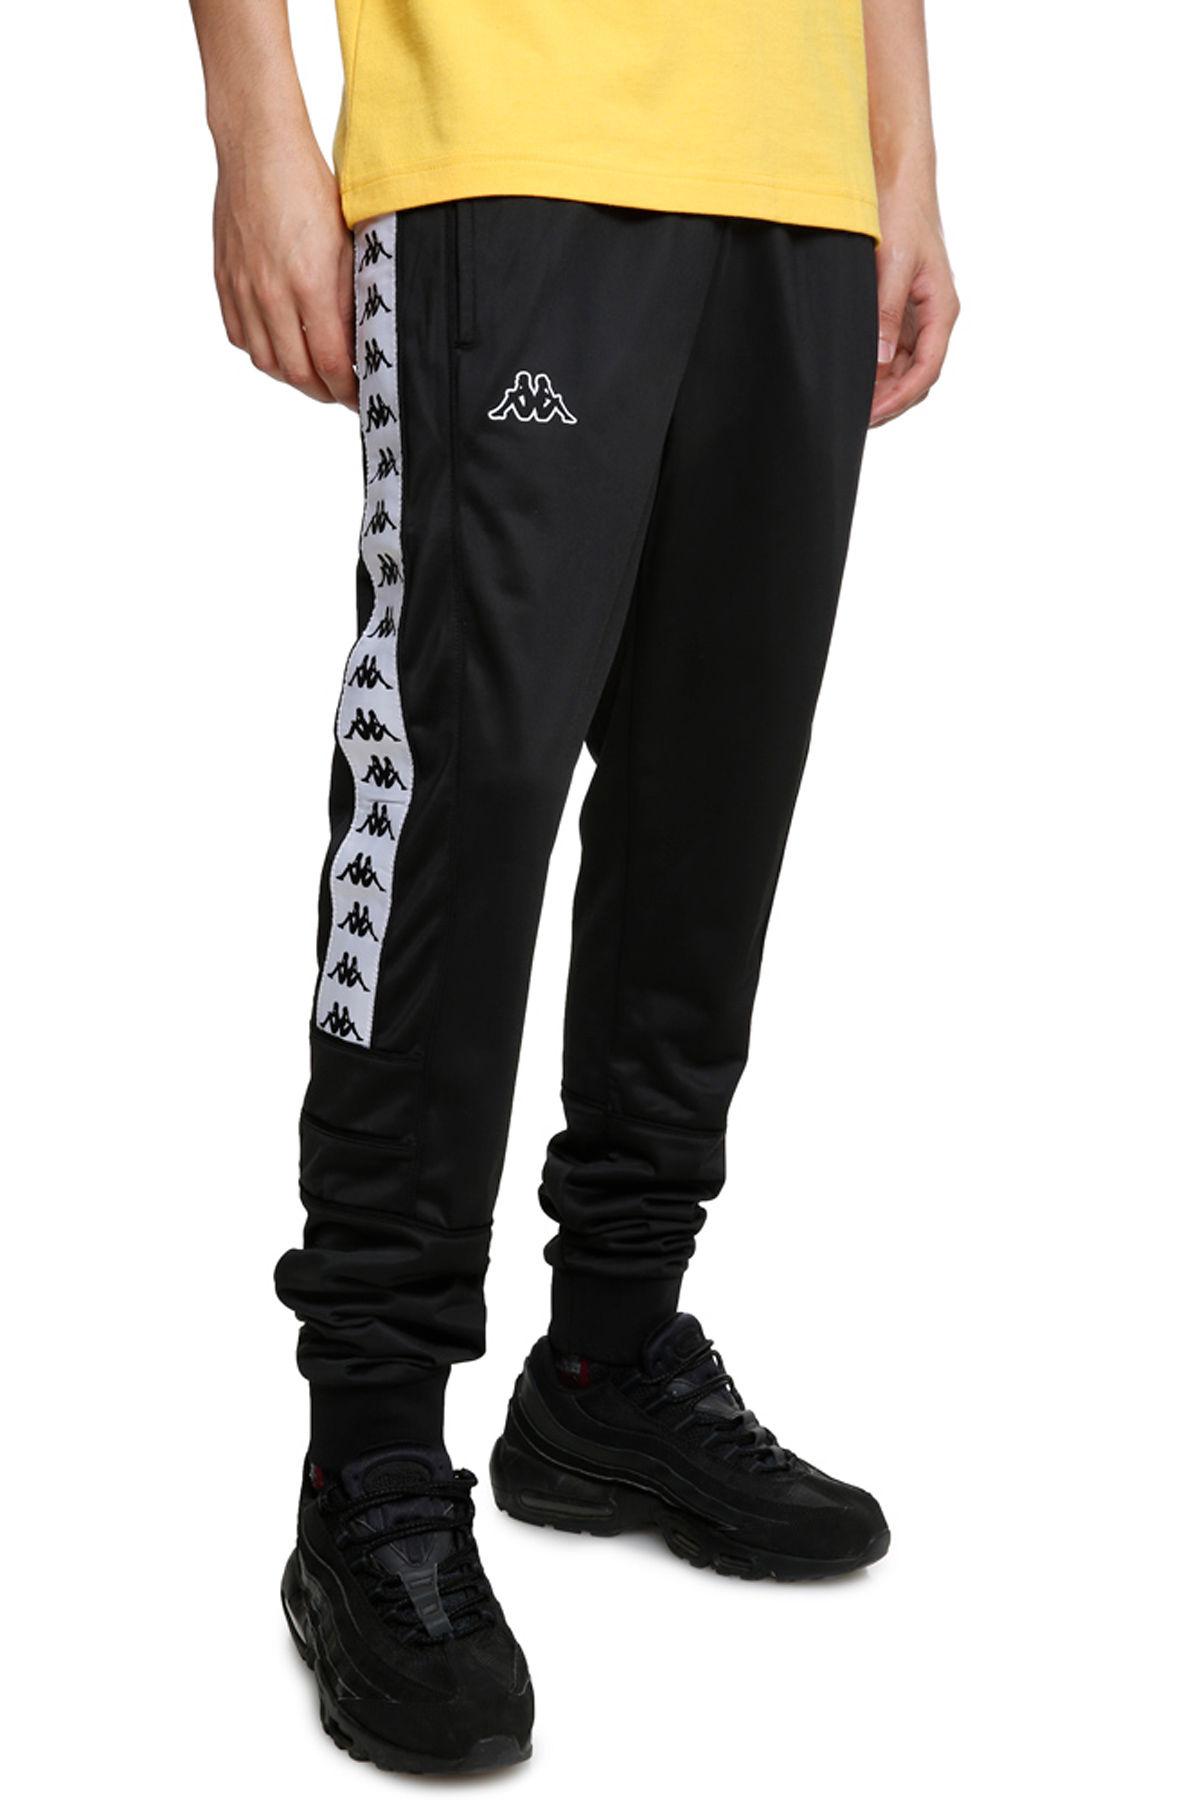 Image of The 222 Banda 10 Alen Pants in Black